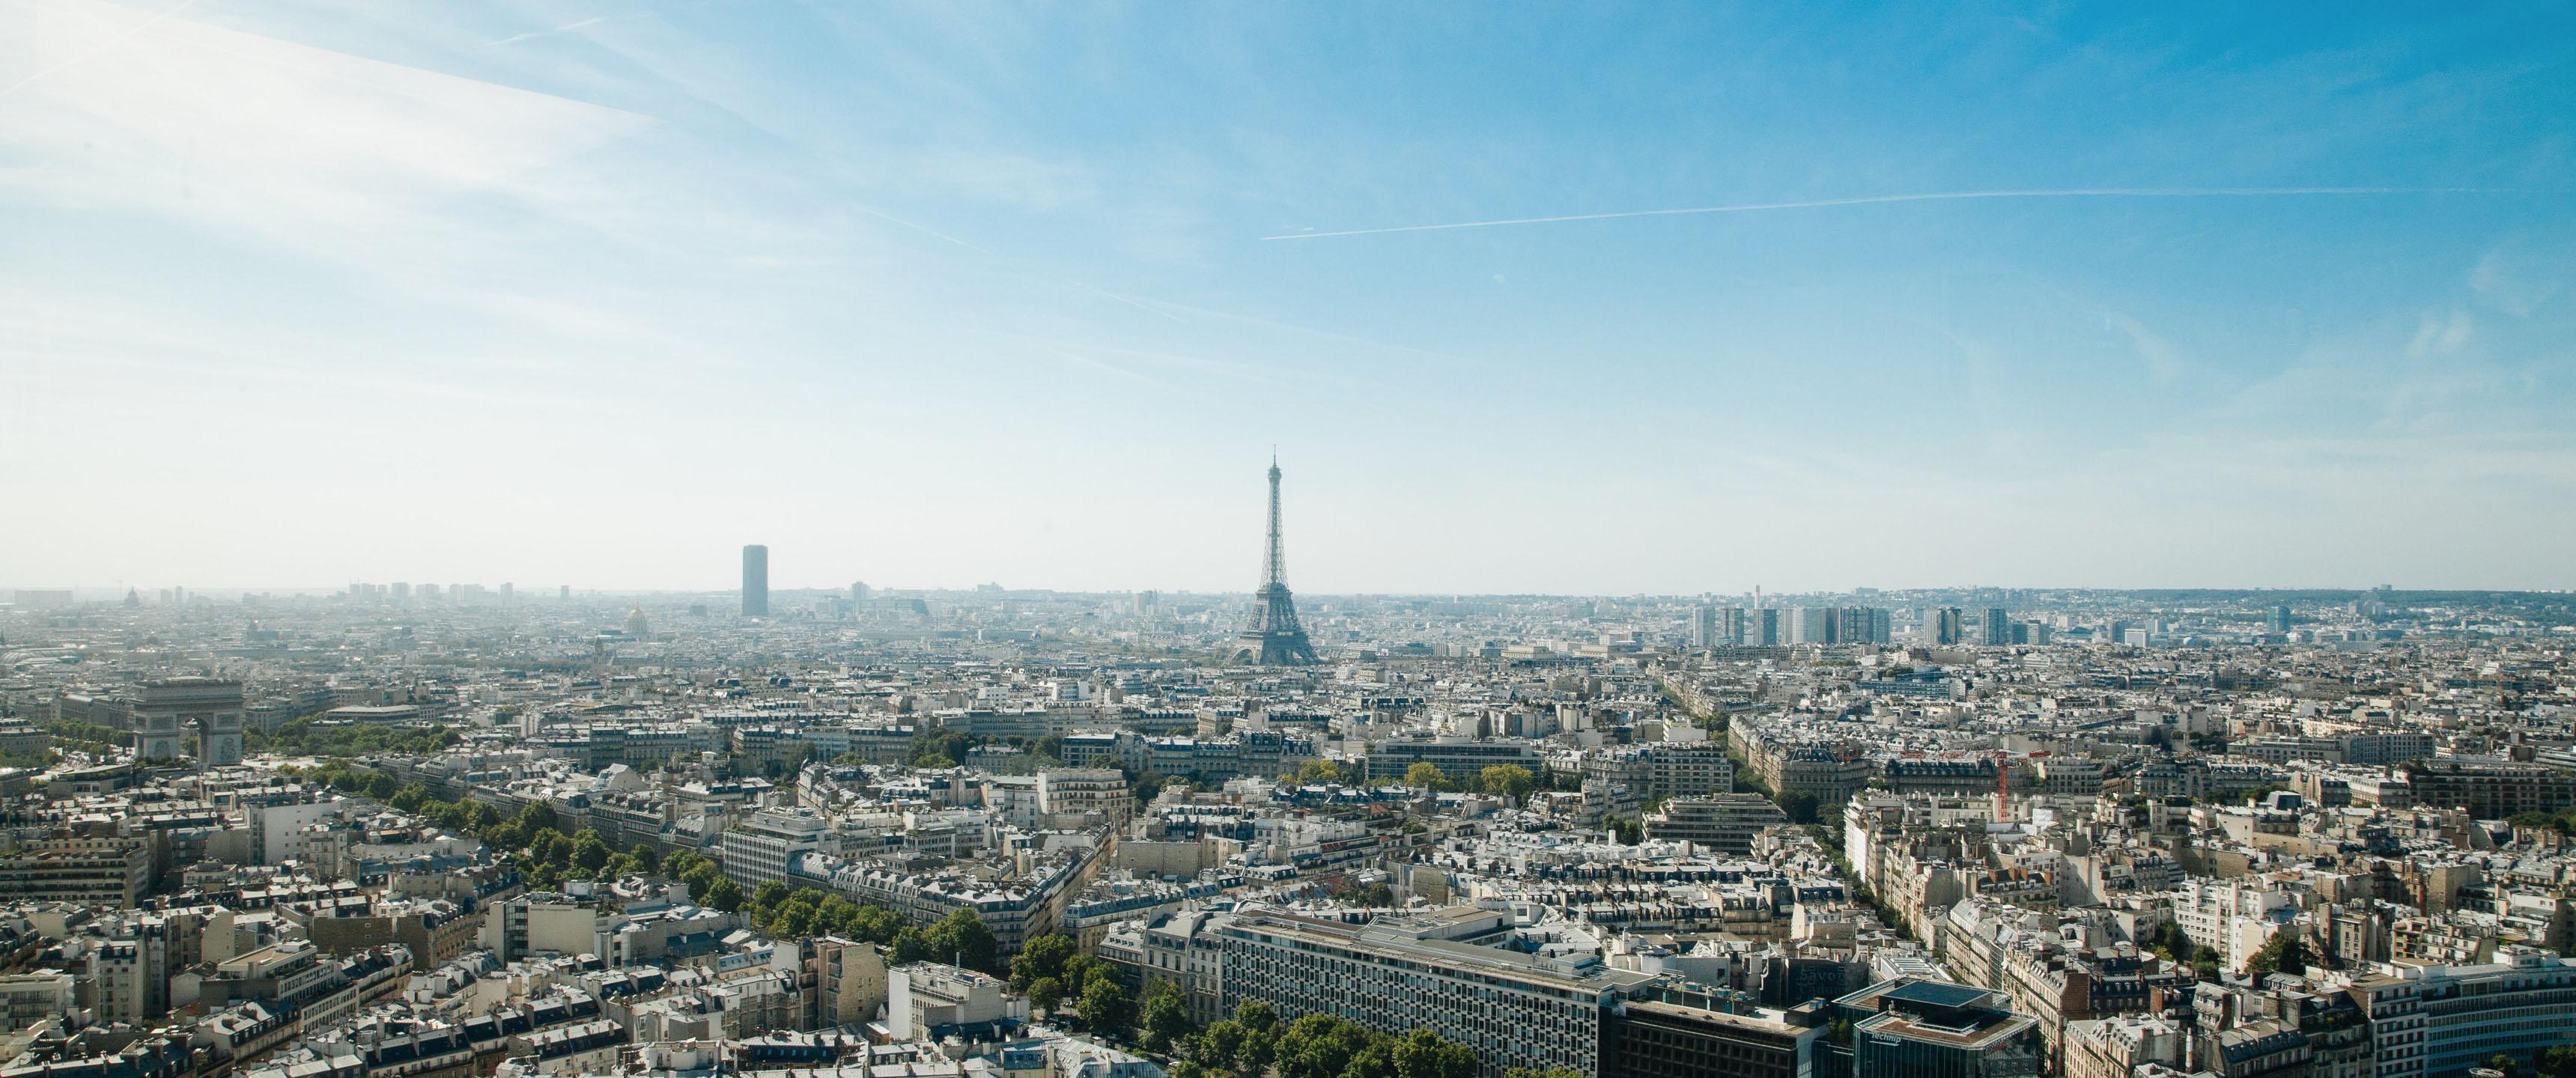 Paris 21 9 Wallpaper Ultrawide Monitor 21 9 Wallpapers